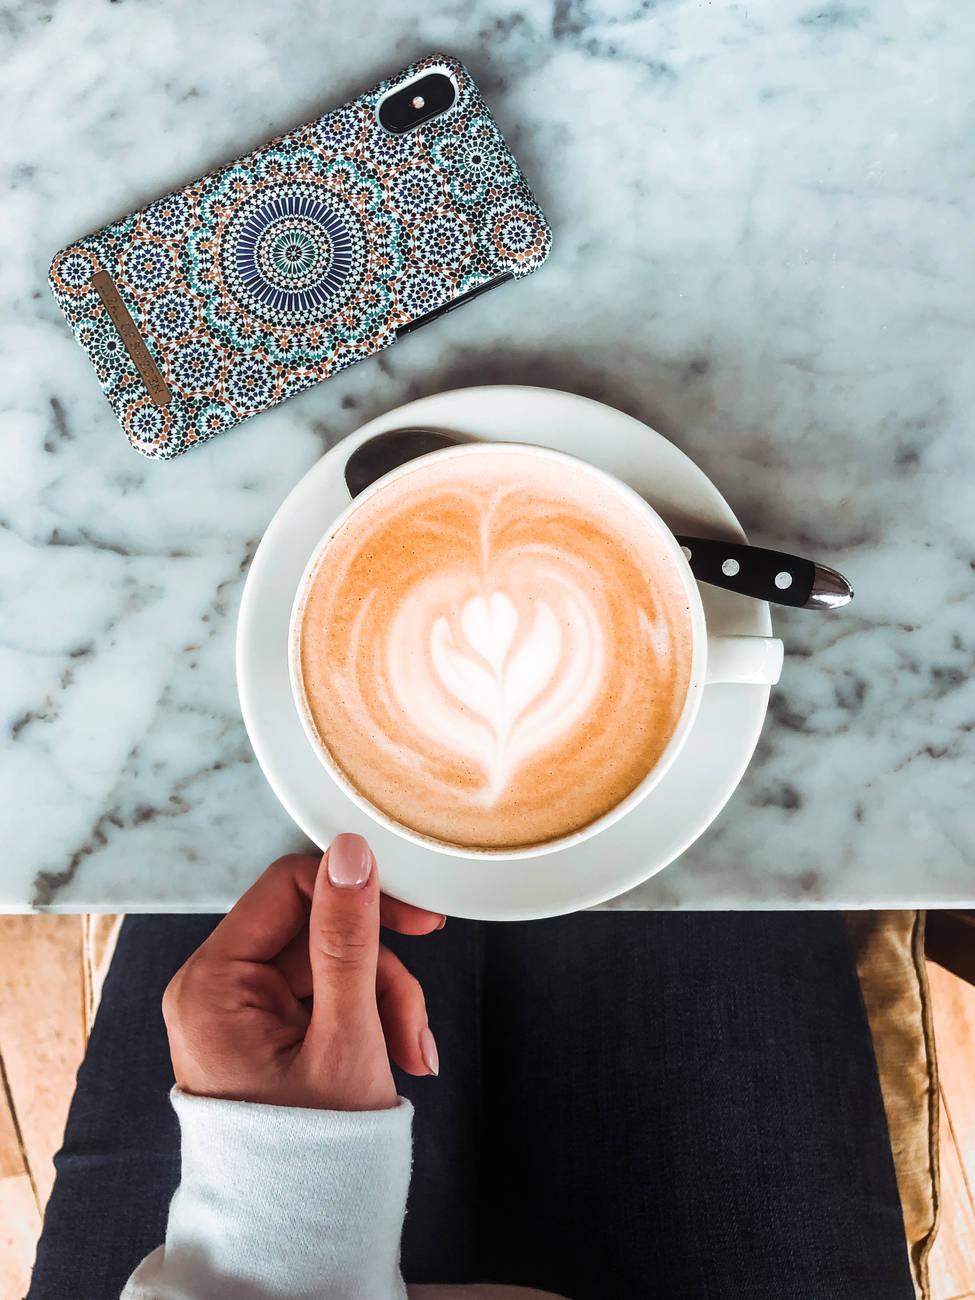 A cup of good coffee in Tallinn